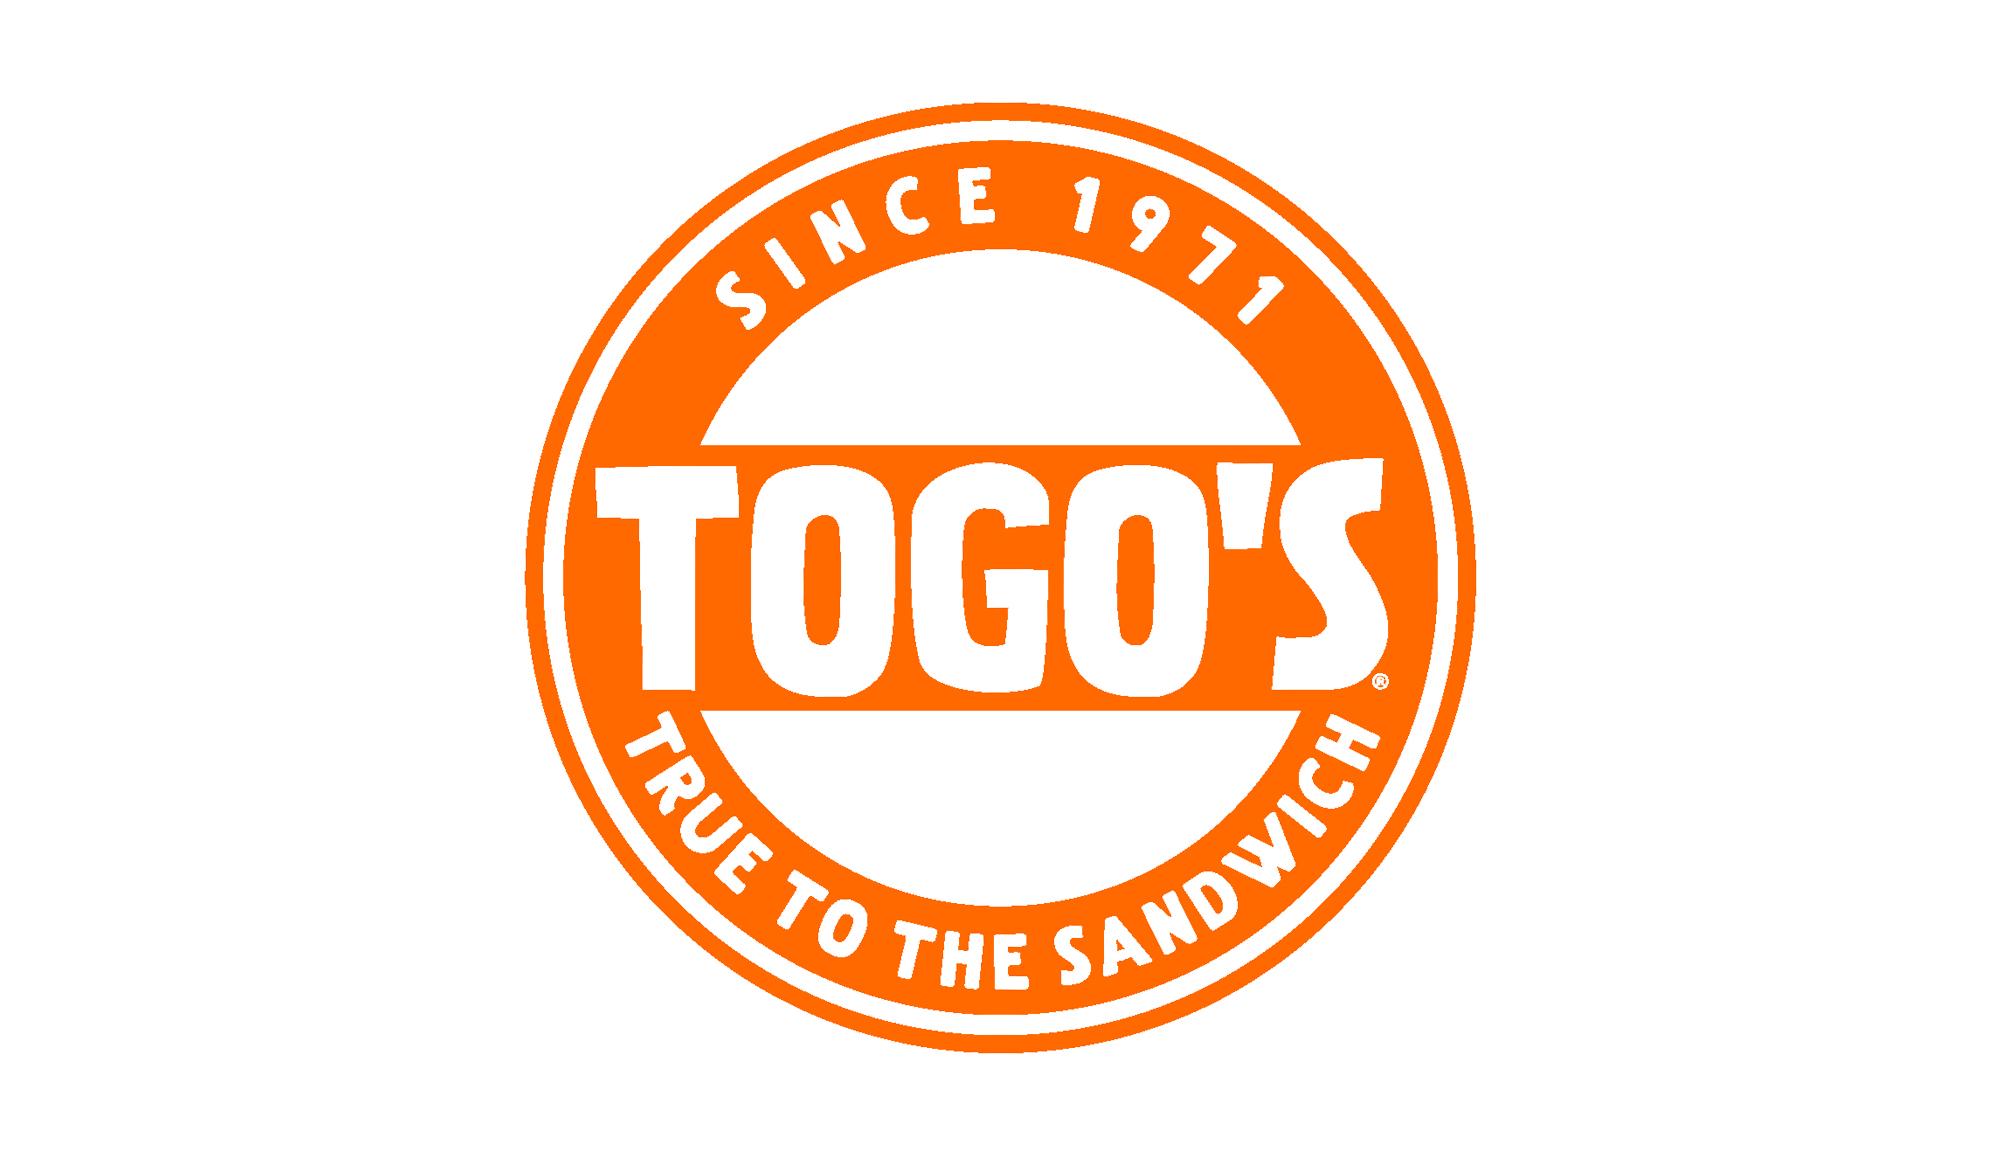 Togo's restaurant logo